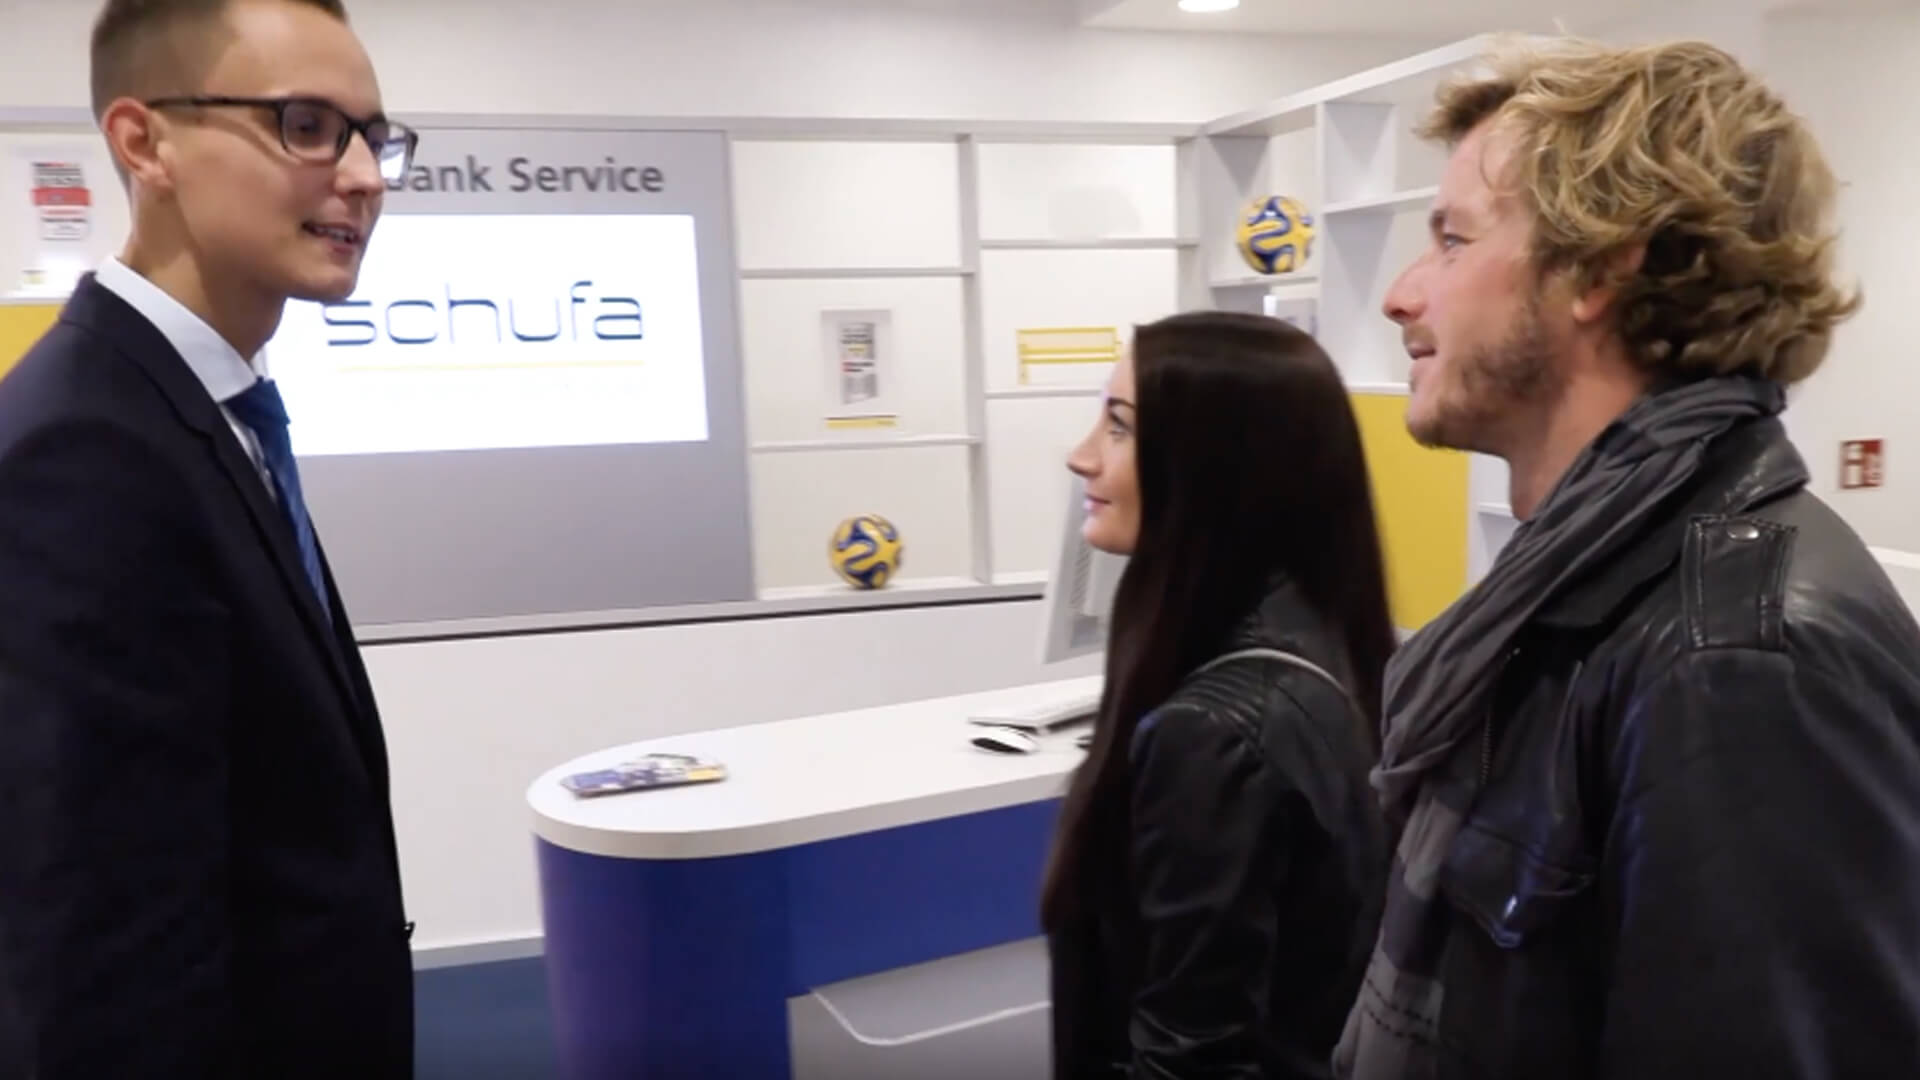 postbank-themenwelten-schufa-bonitaetsauskunft-video-1920x1080.jpg